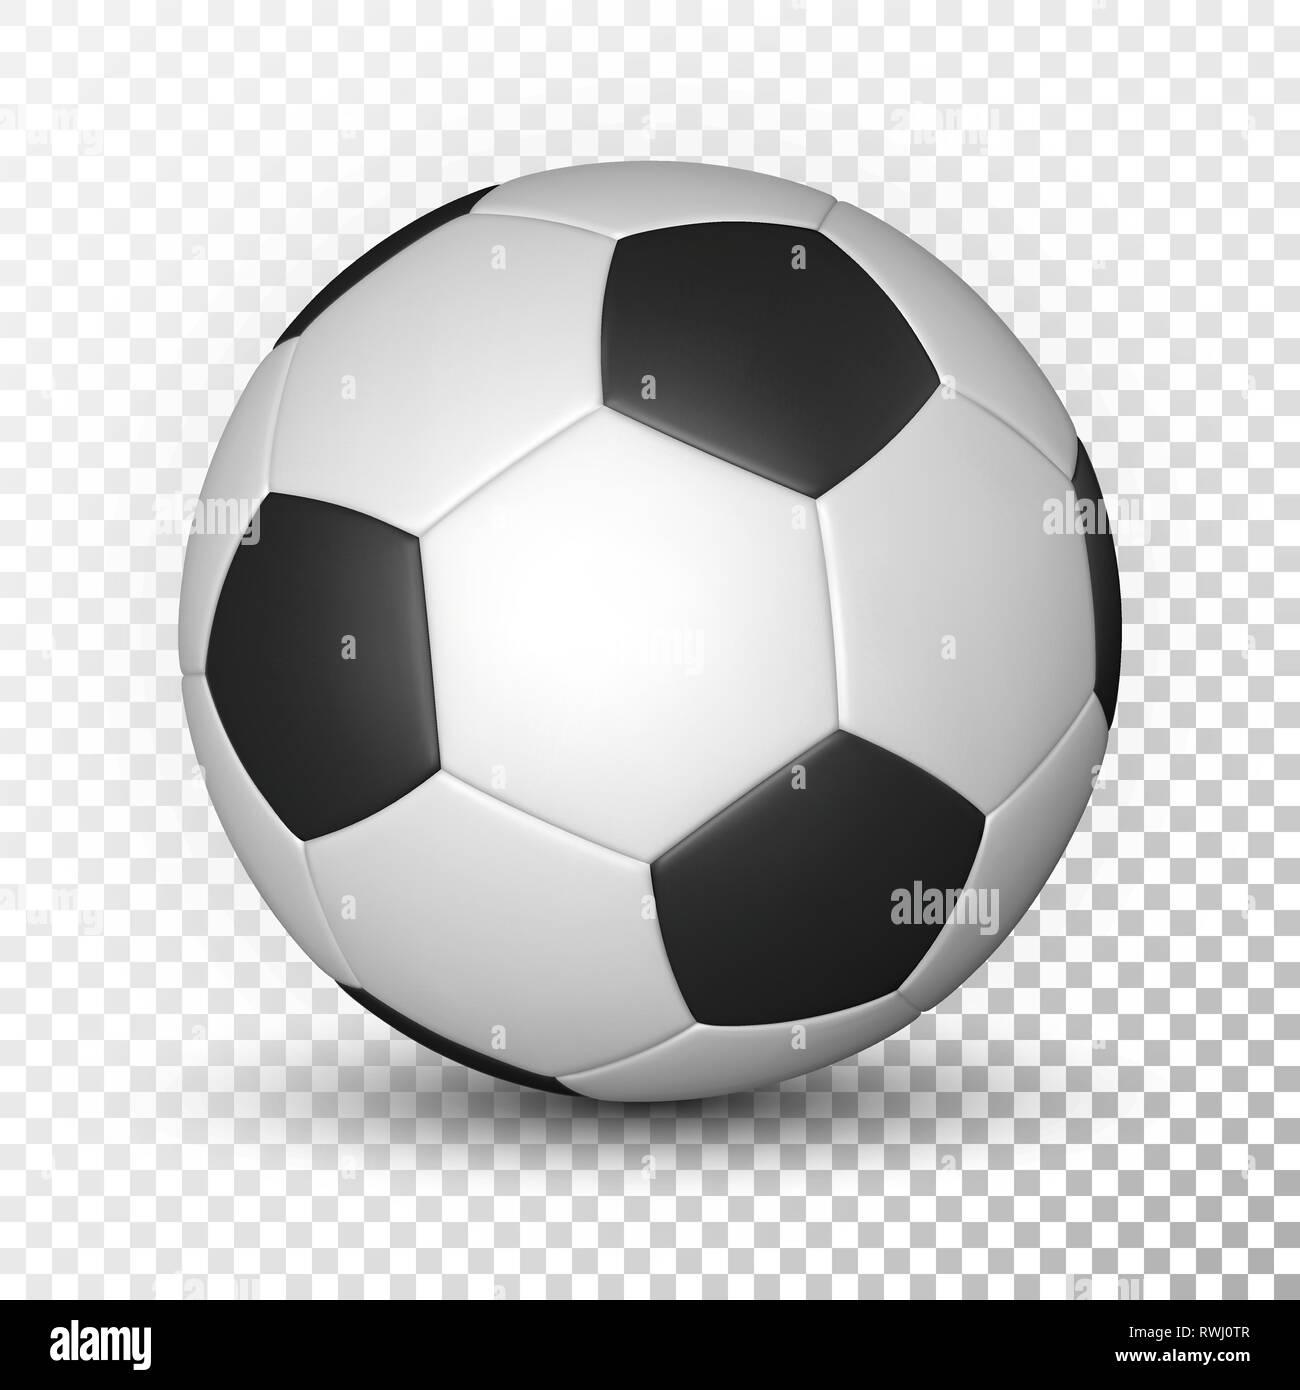 Football Ball Soccer Ball Mockup On Transparent Background Vector Illustration Stock Vector Image Art Alamy